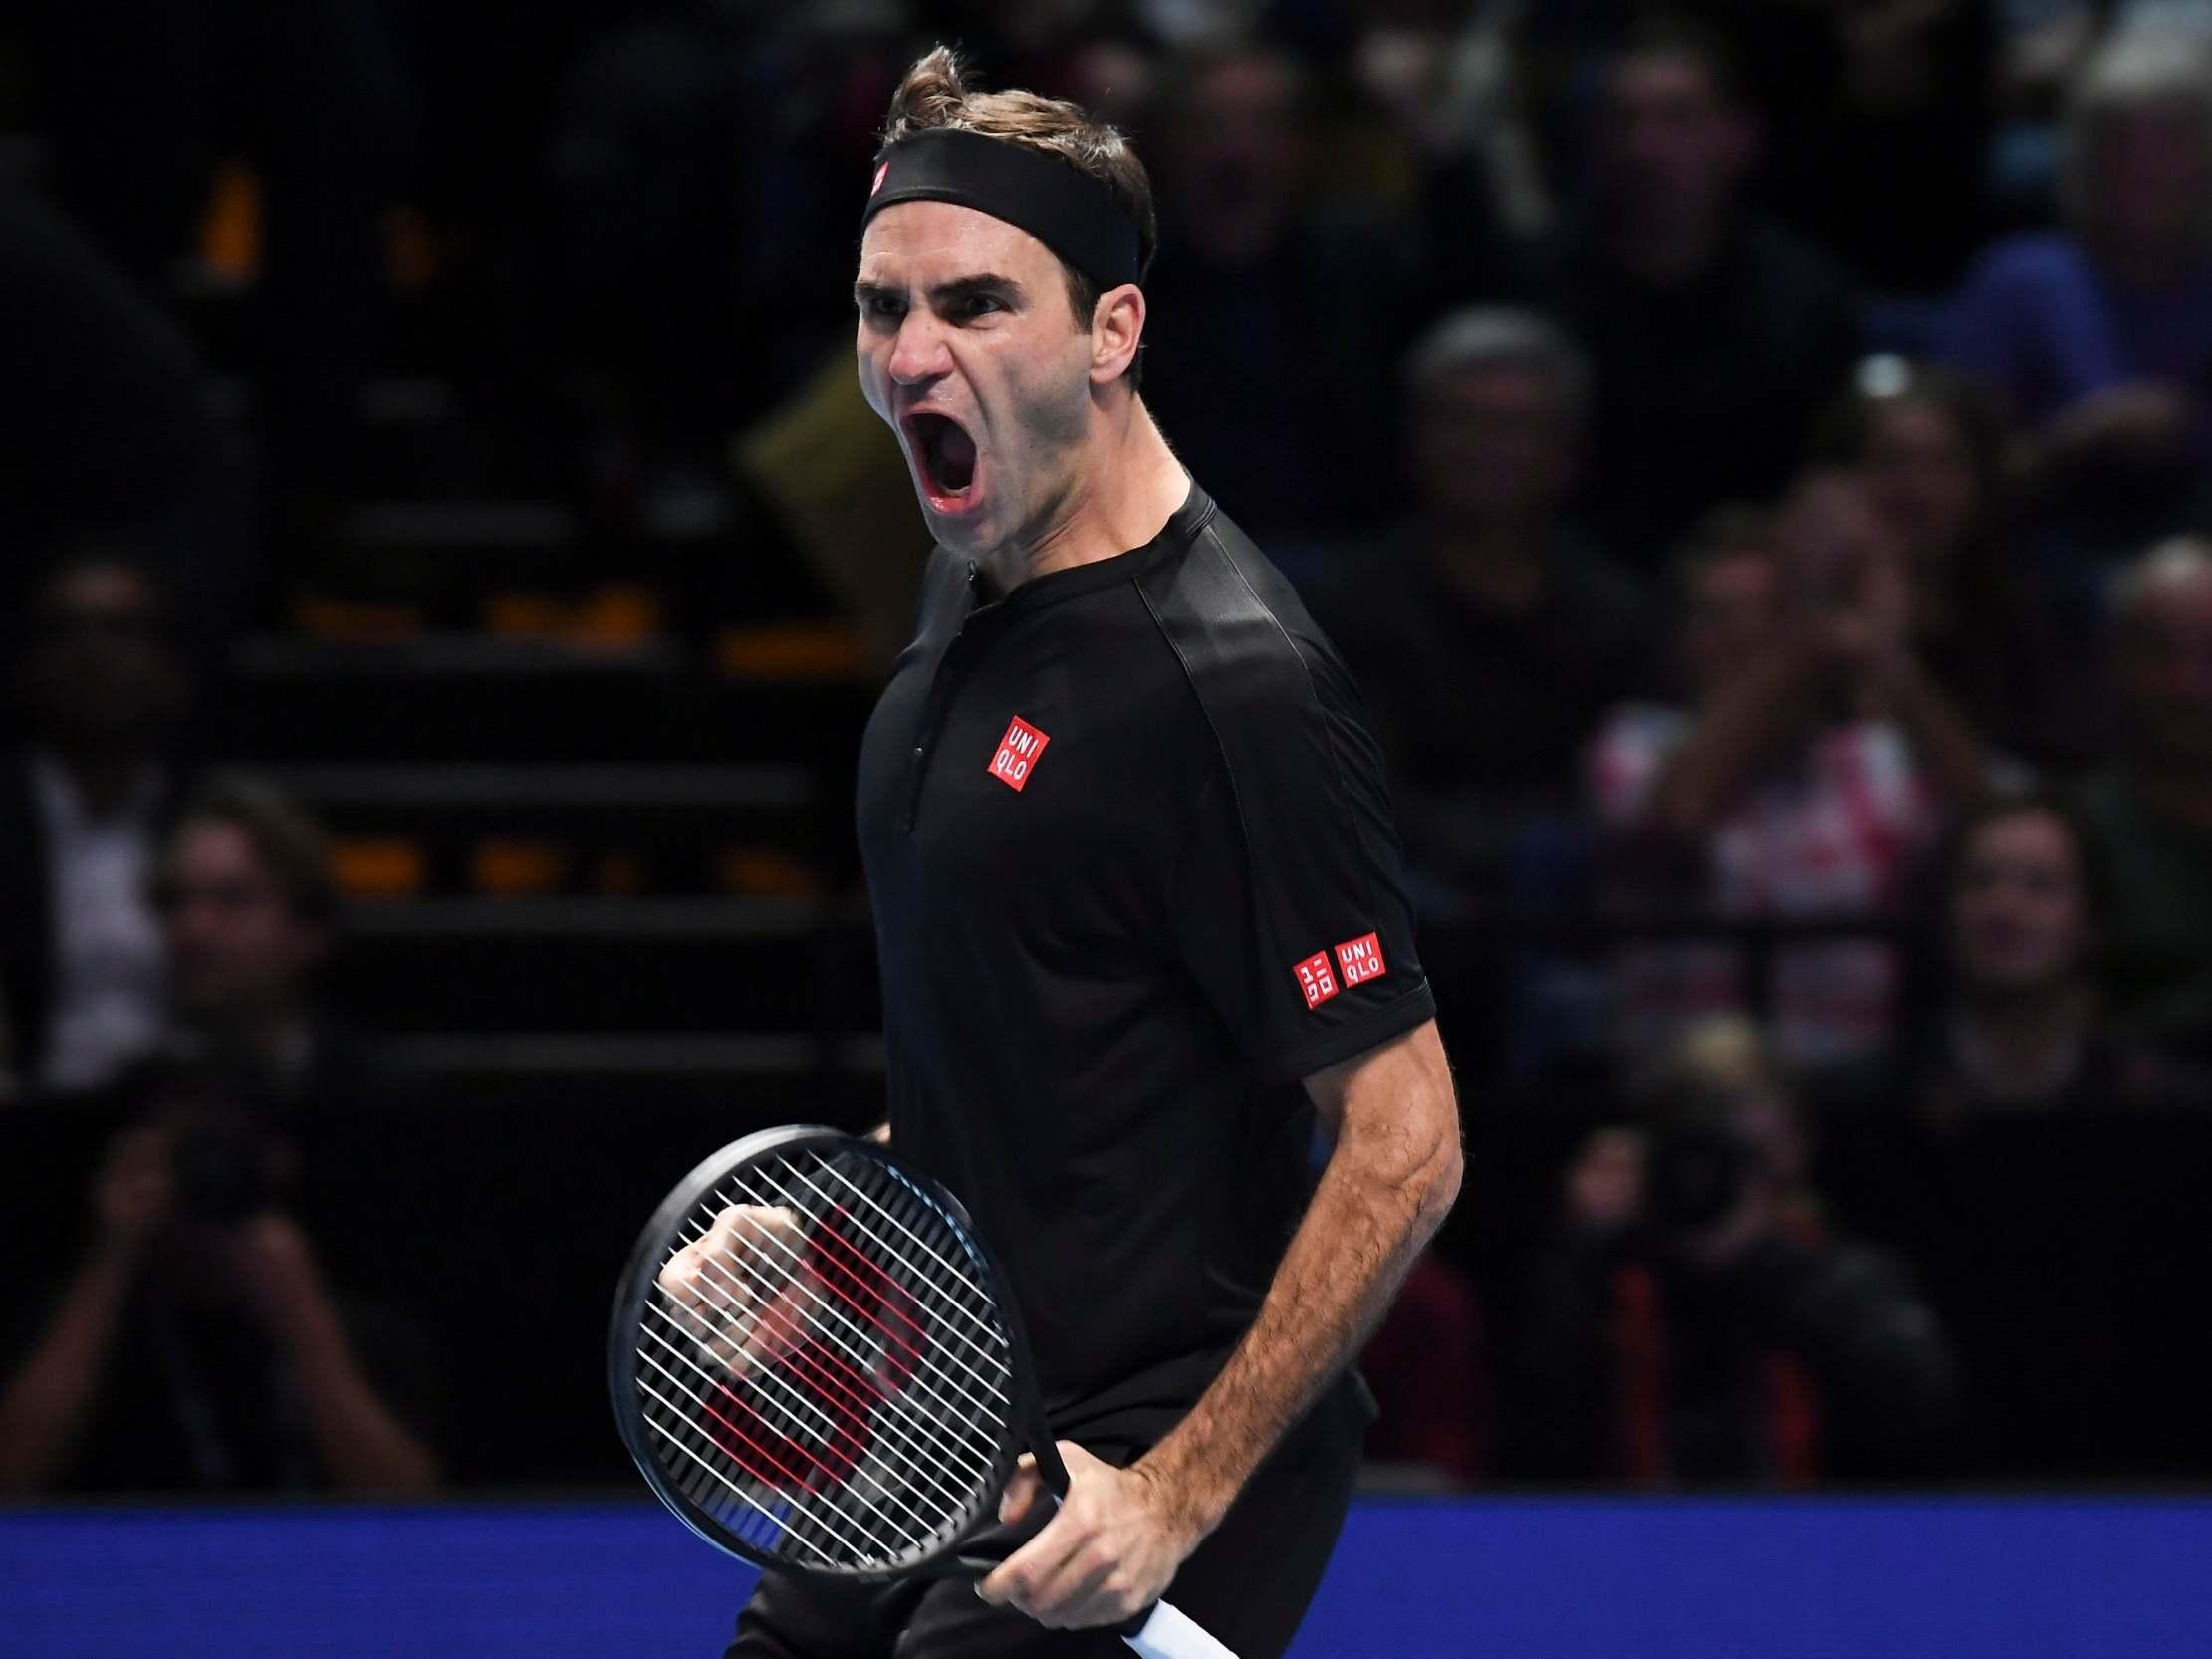 ATP Finals: Roger Federer avenges Wimbledon agony with victory over Novak Djokovic